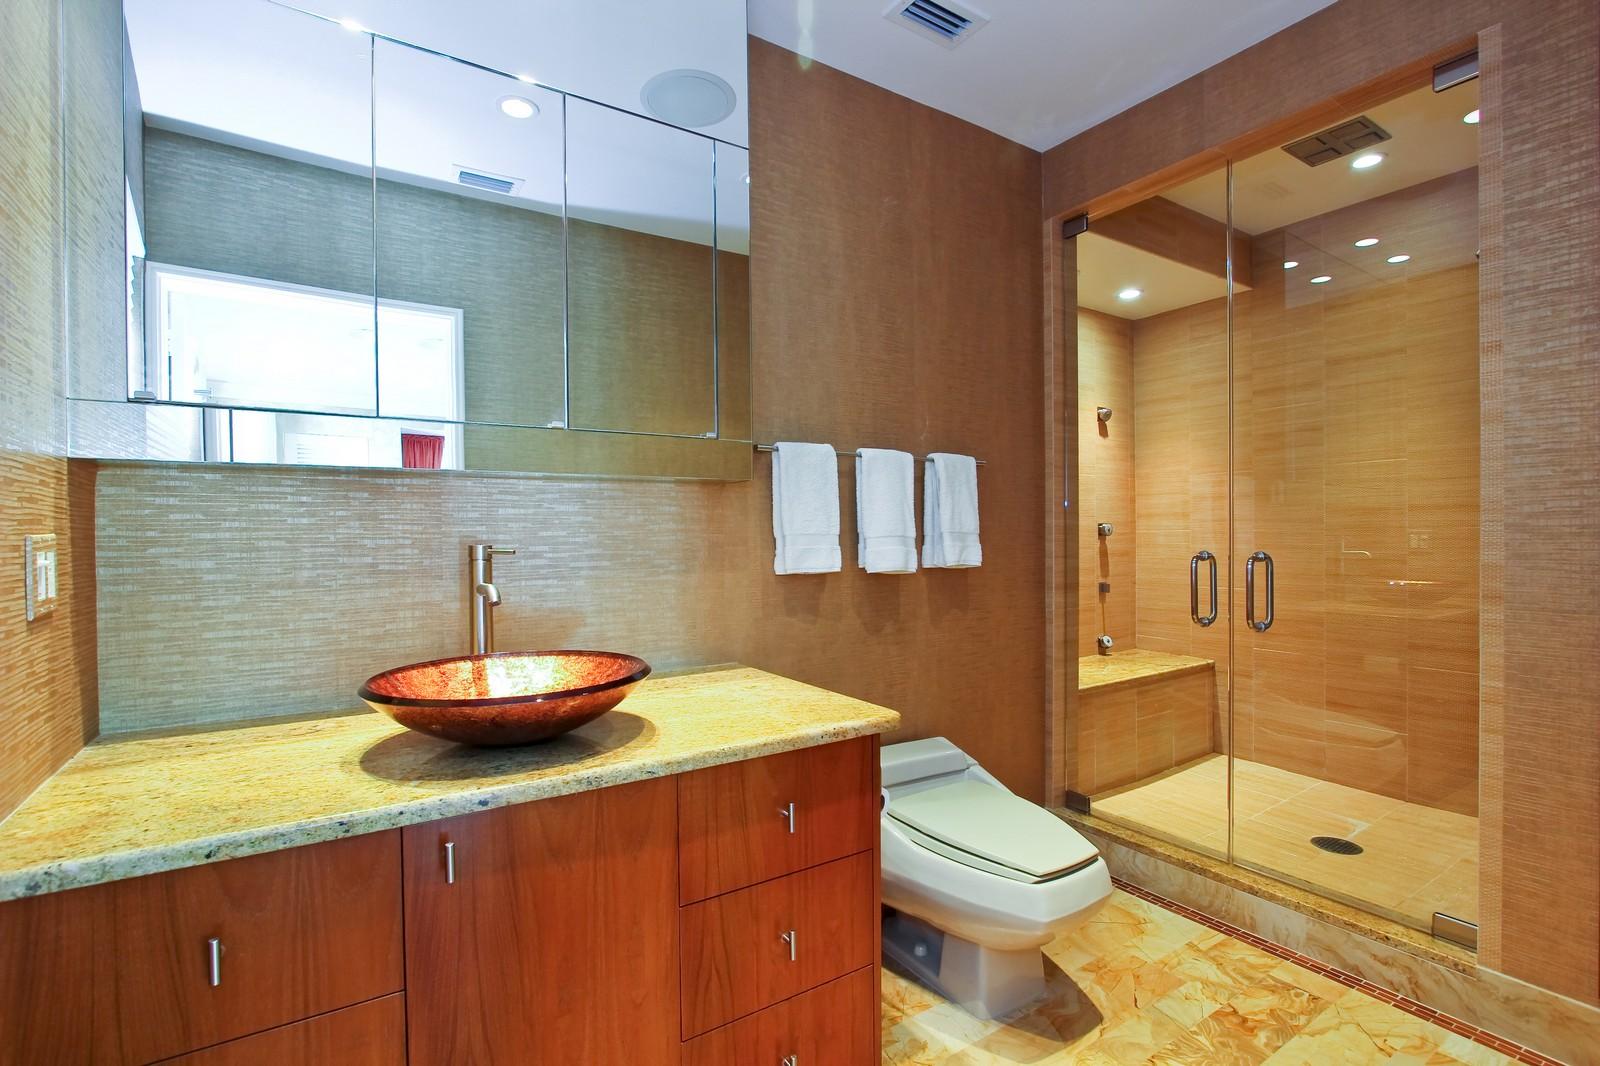 Real Estate Photography - 301 Garden Rd, Palm Beach, FL, 33480 - Master Bathroom